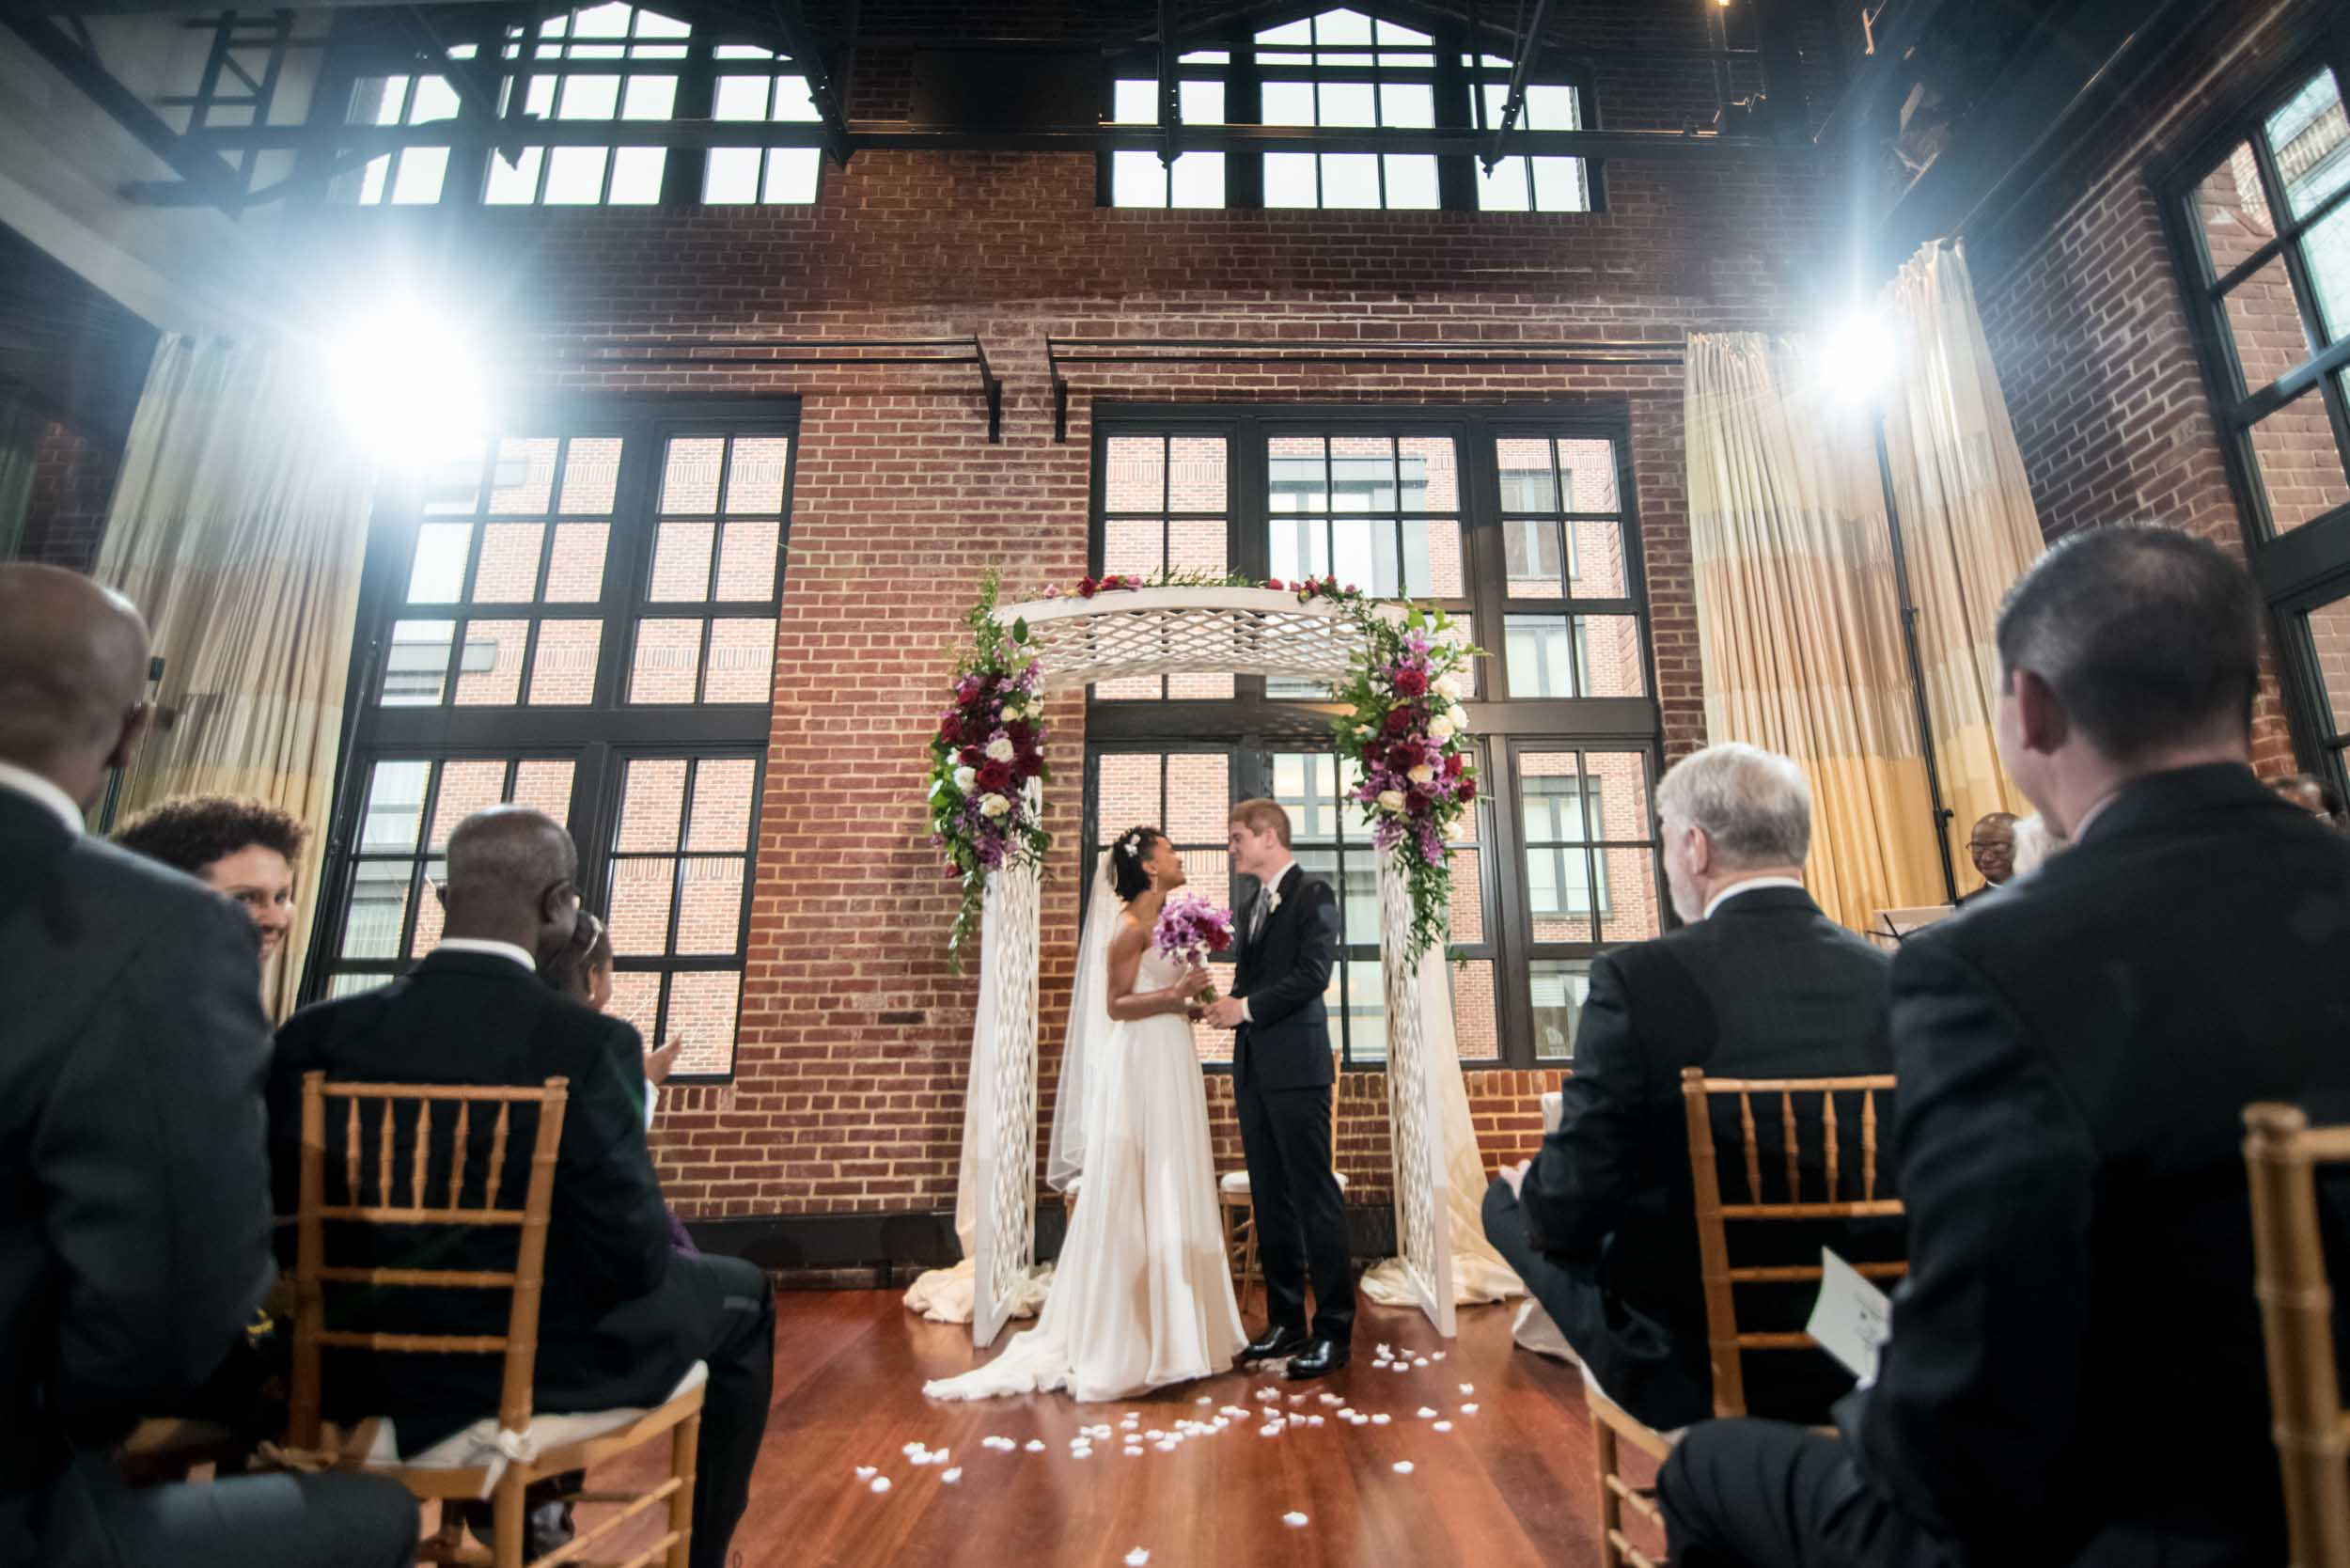 dc+metro+wedding+photographer+vadym+guliuk+photography+wedding+ceremony-2028.jpg